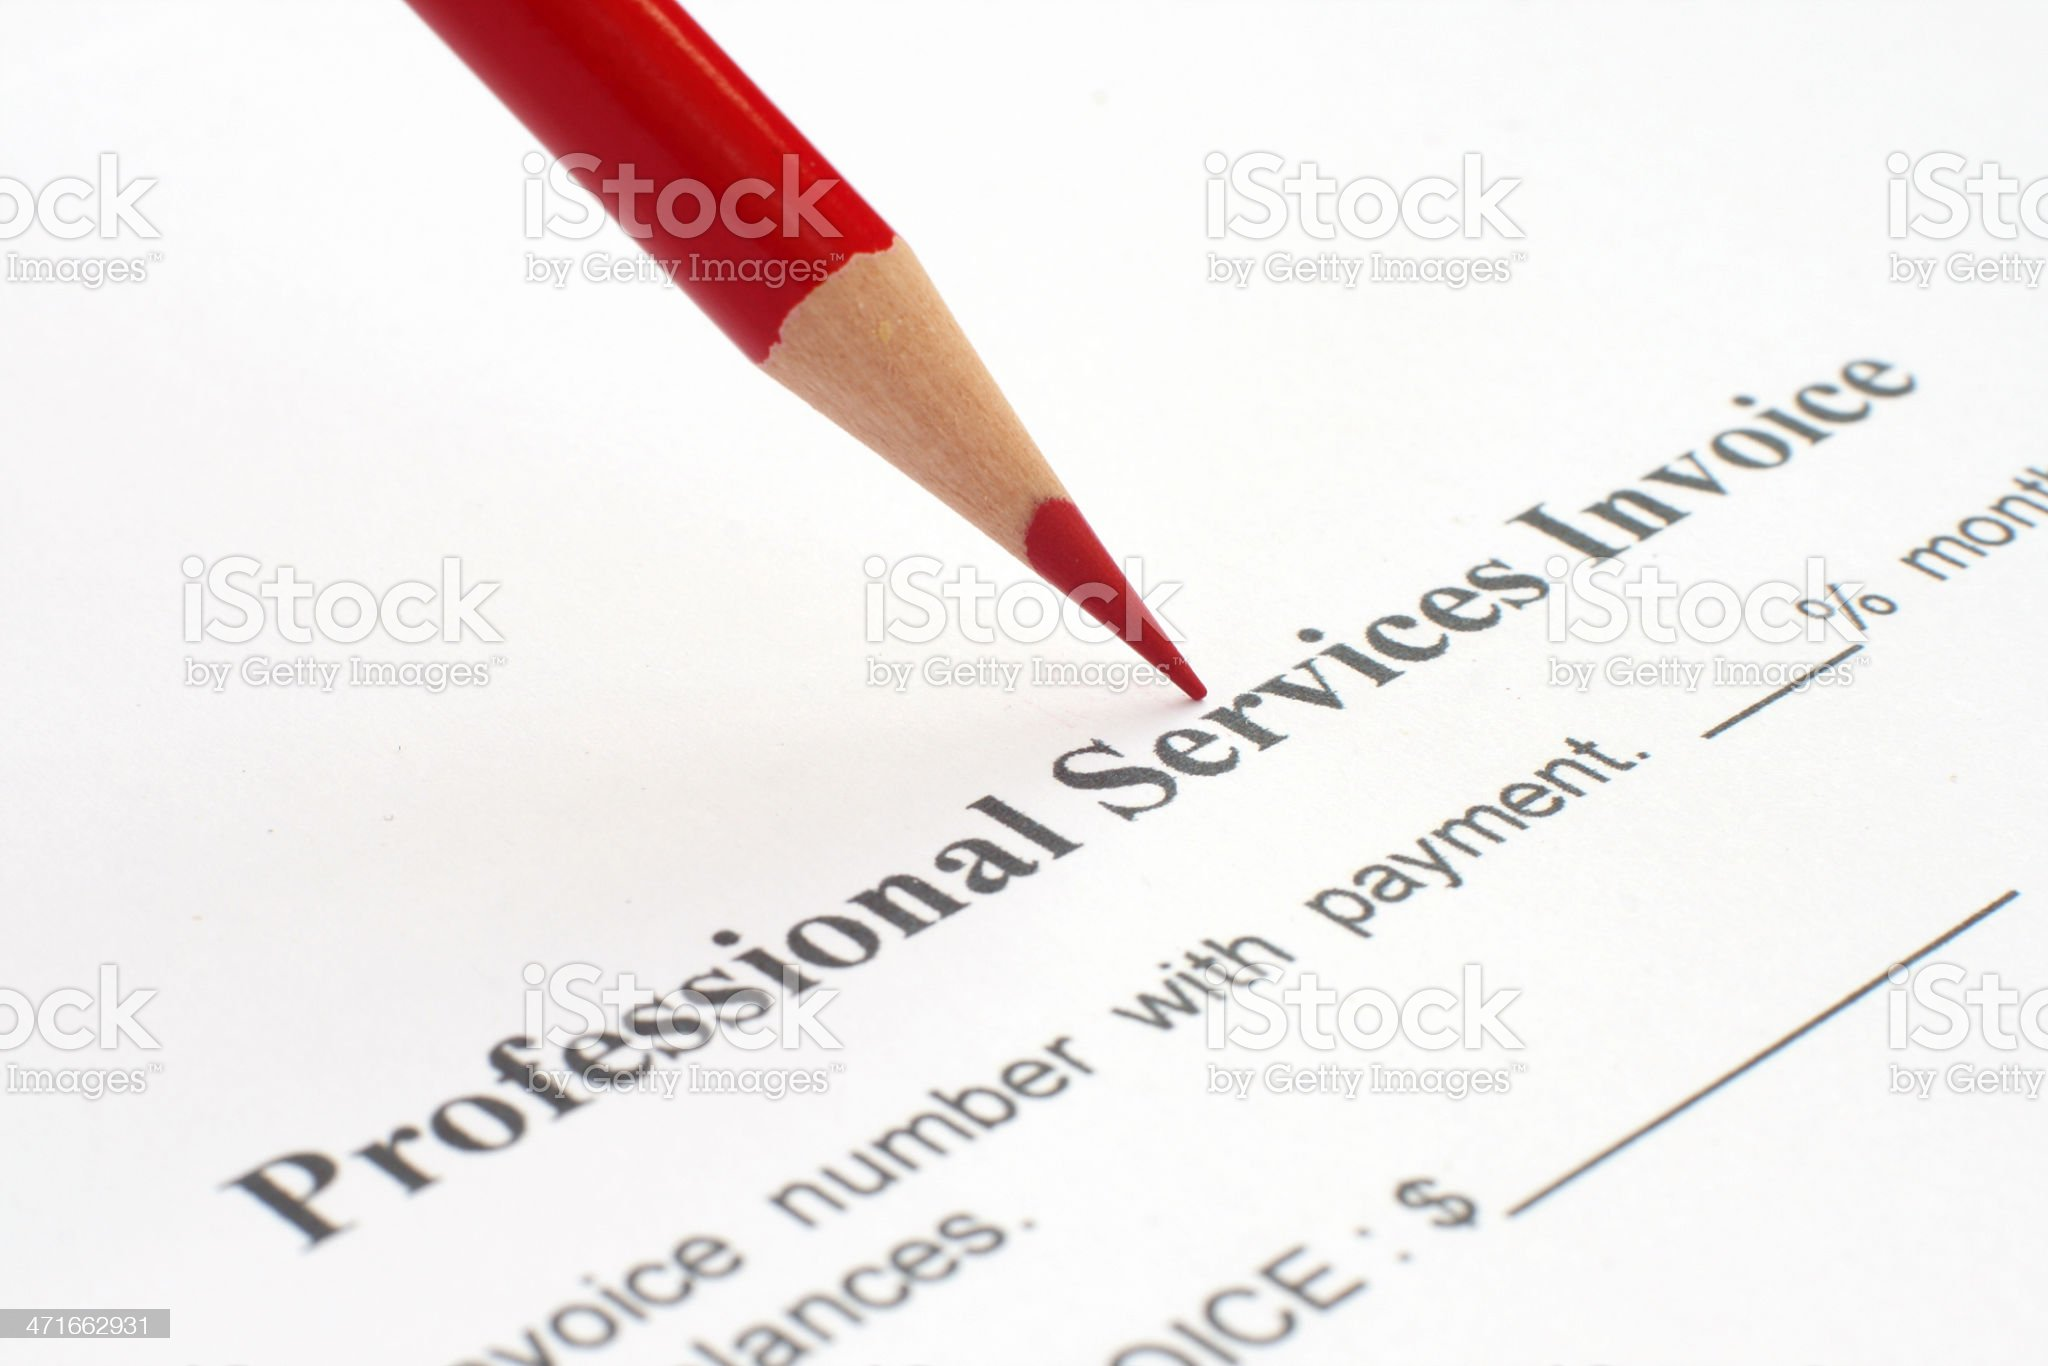 Professional service invoice royalty-free stock photo